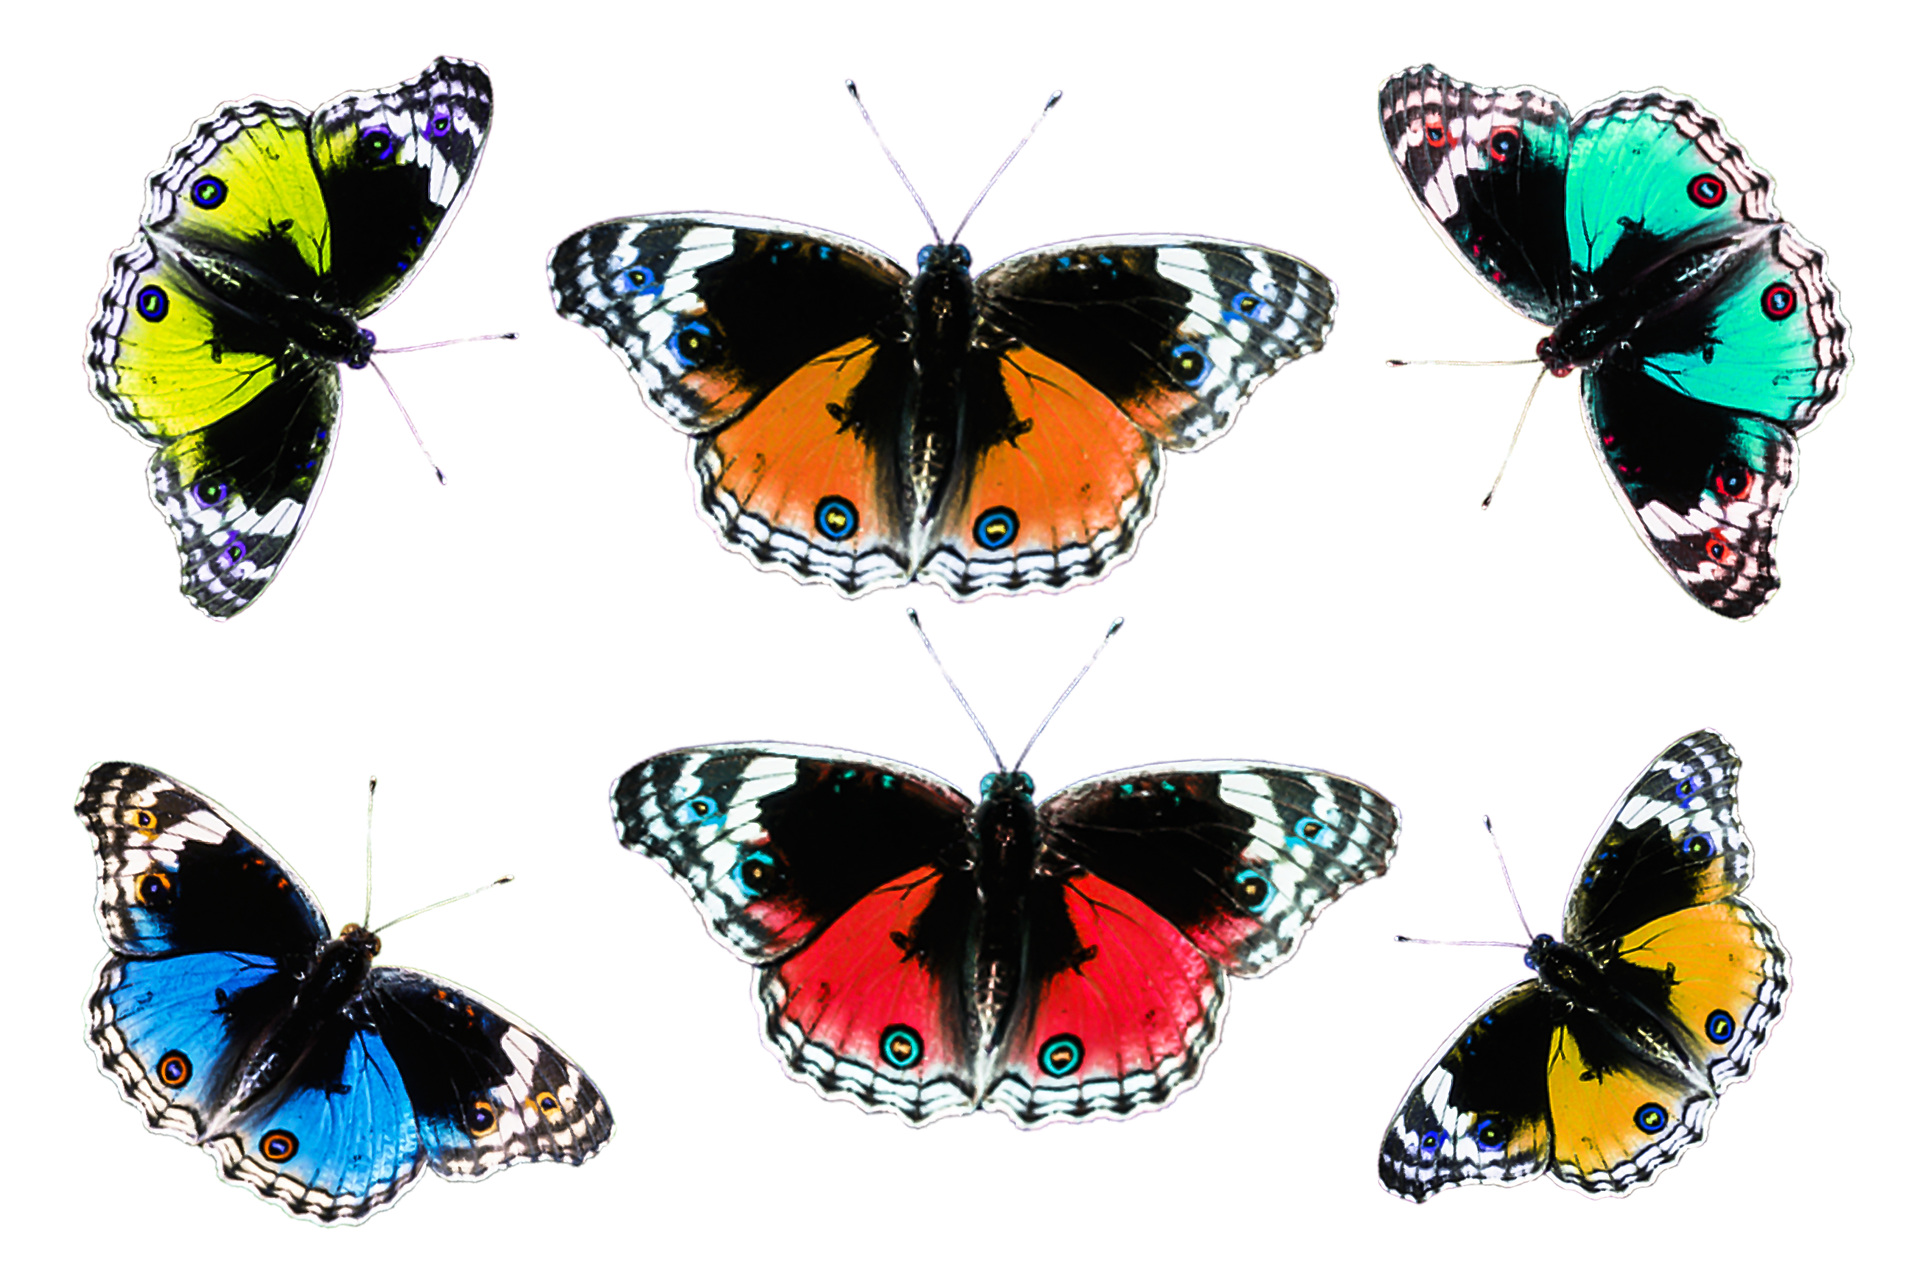 Butterflies on paper photo